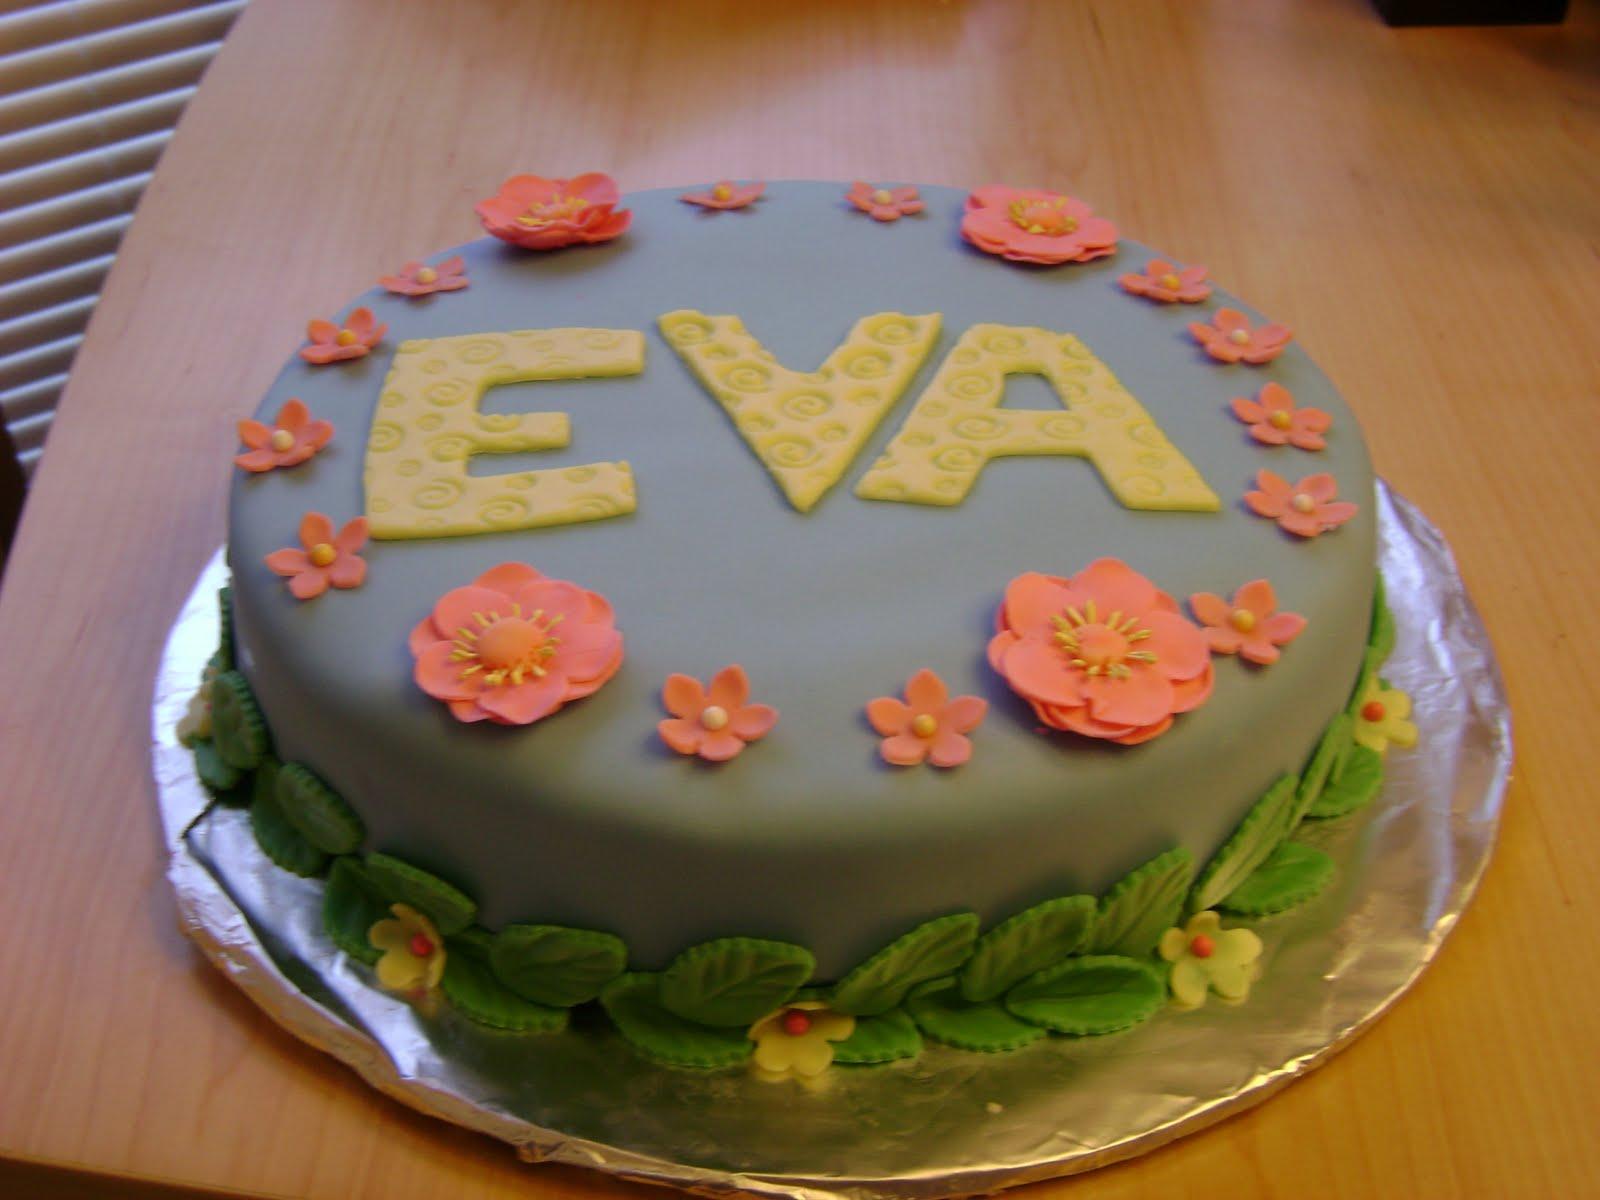 Cakes by Lala November 2009